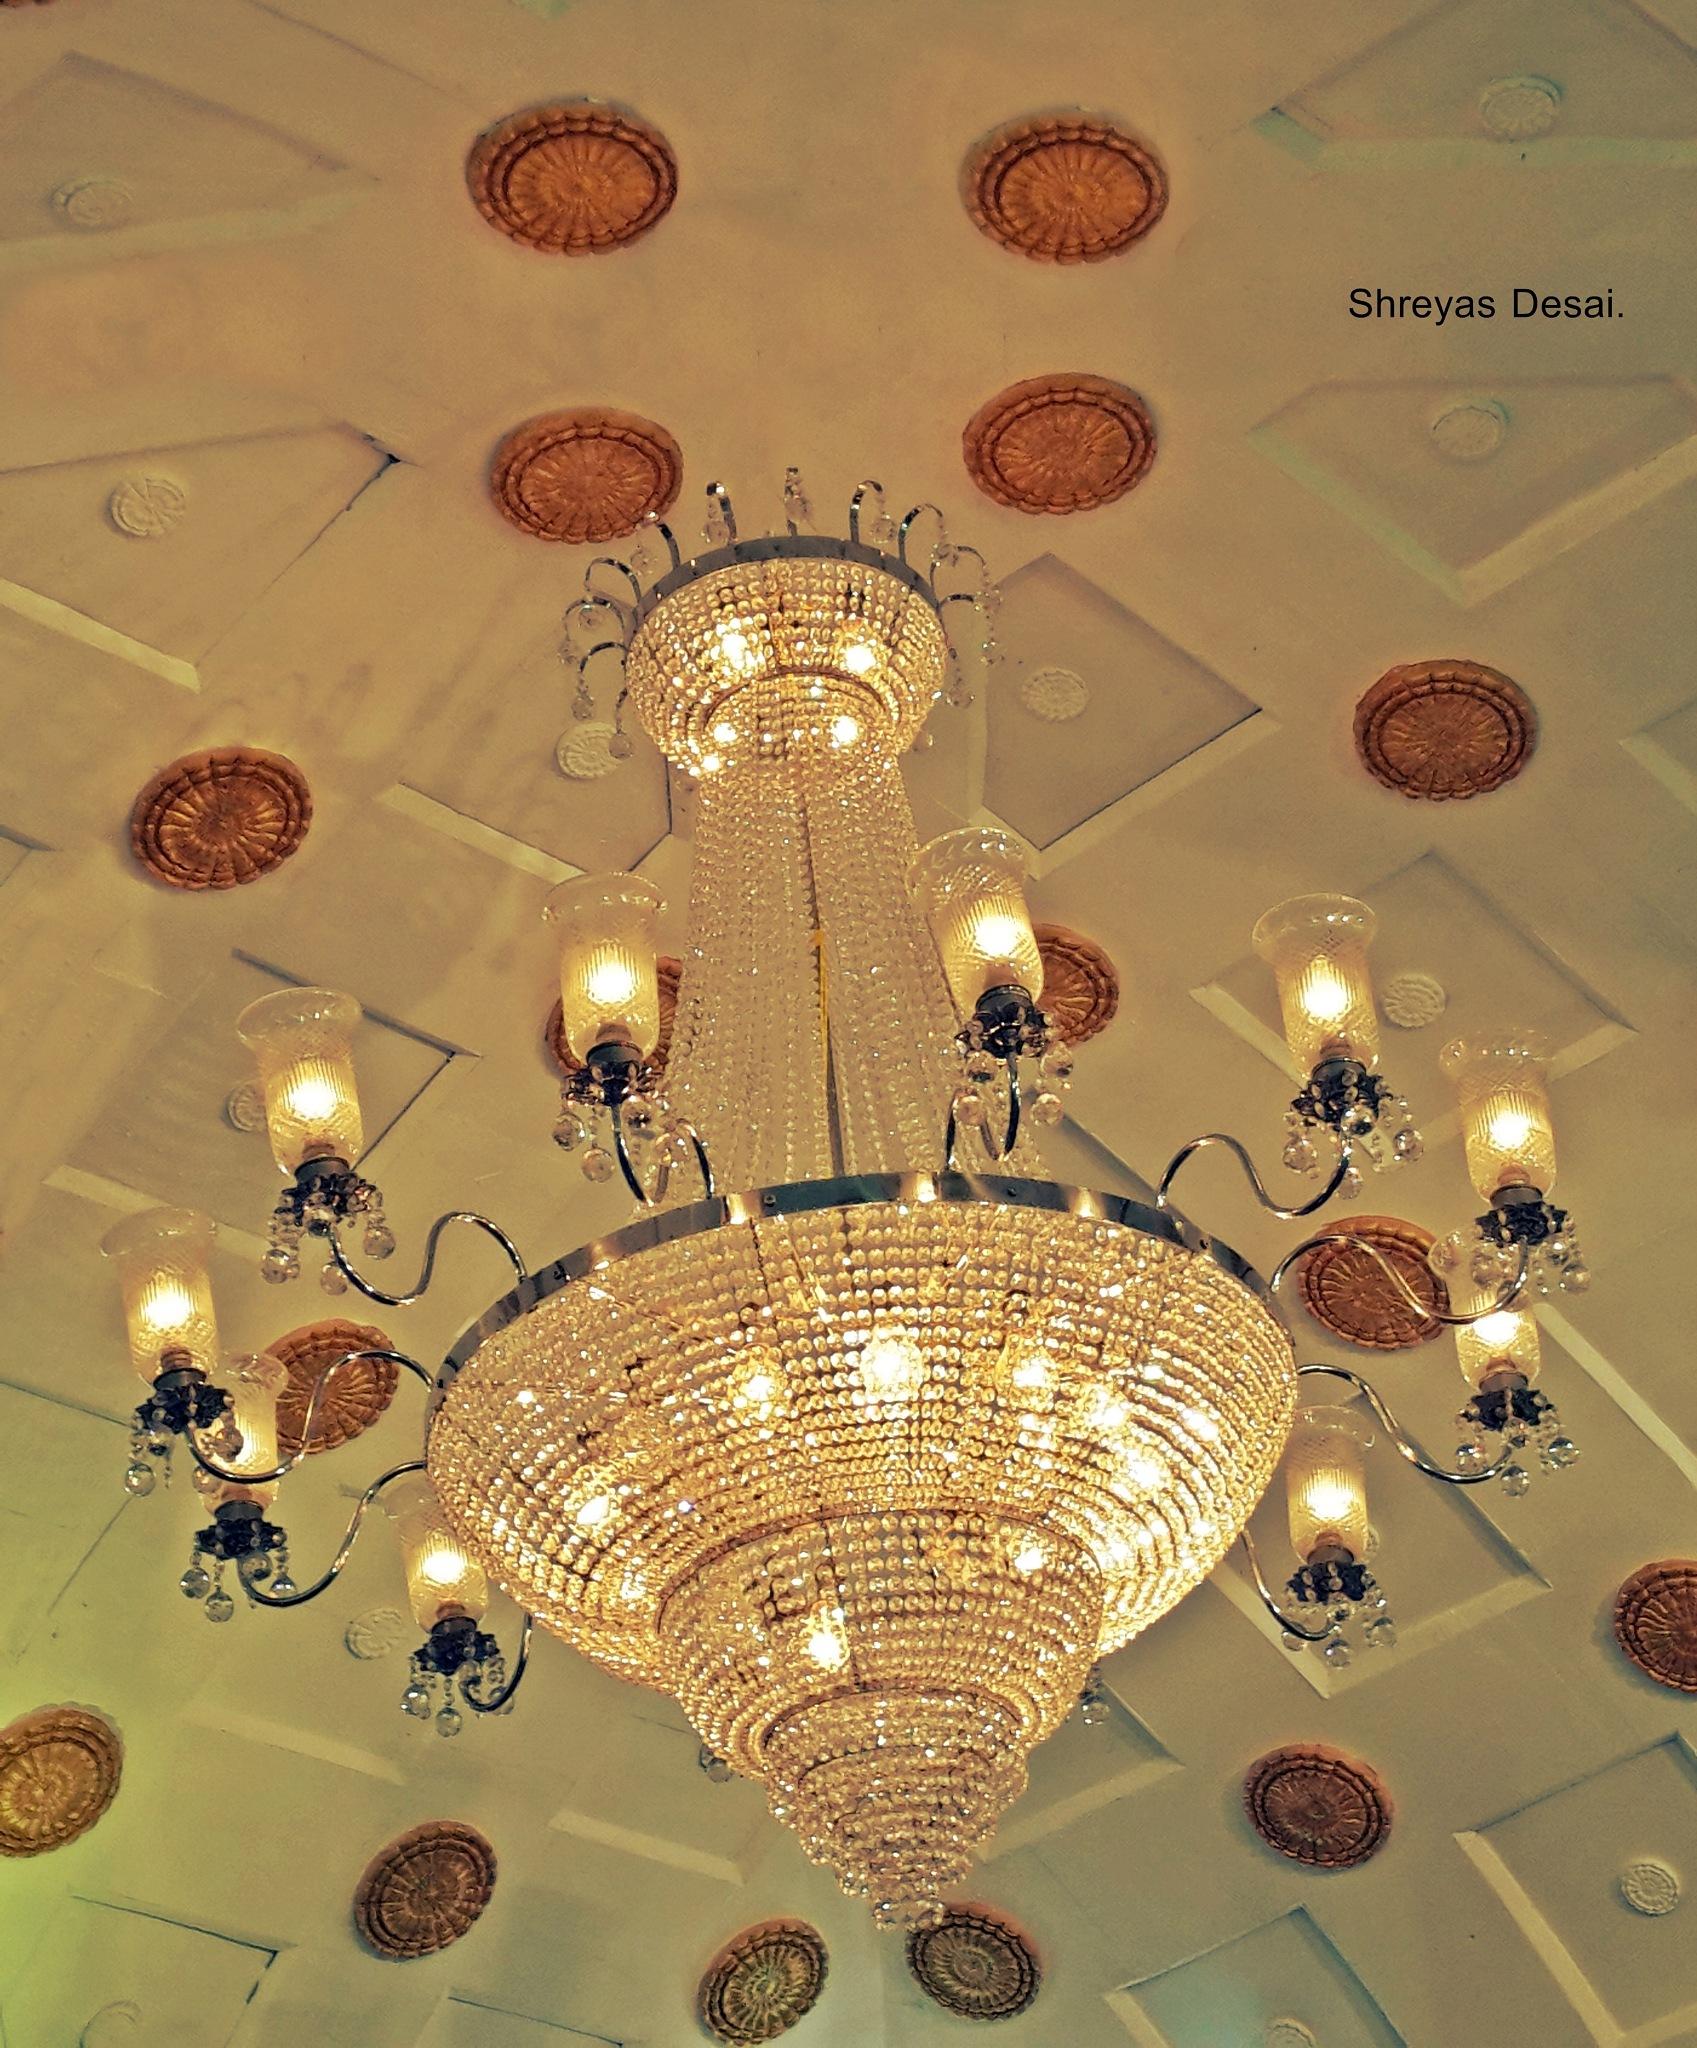 Chandelier  by Shreyas Desai